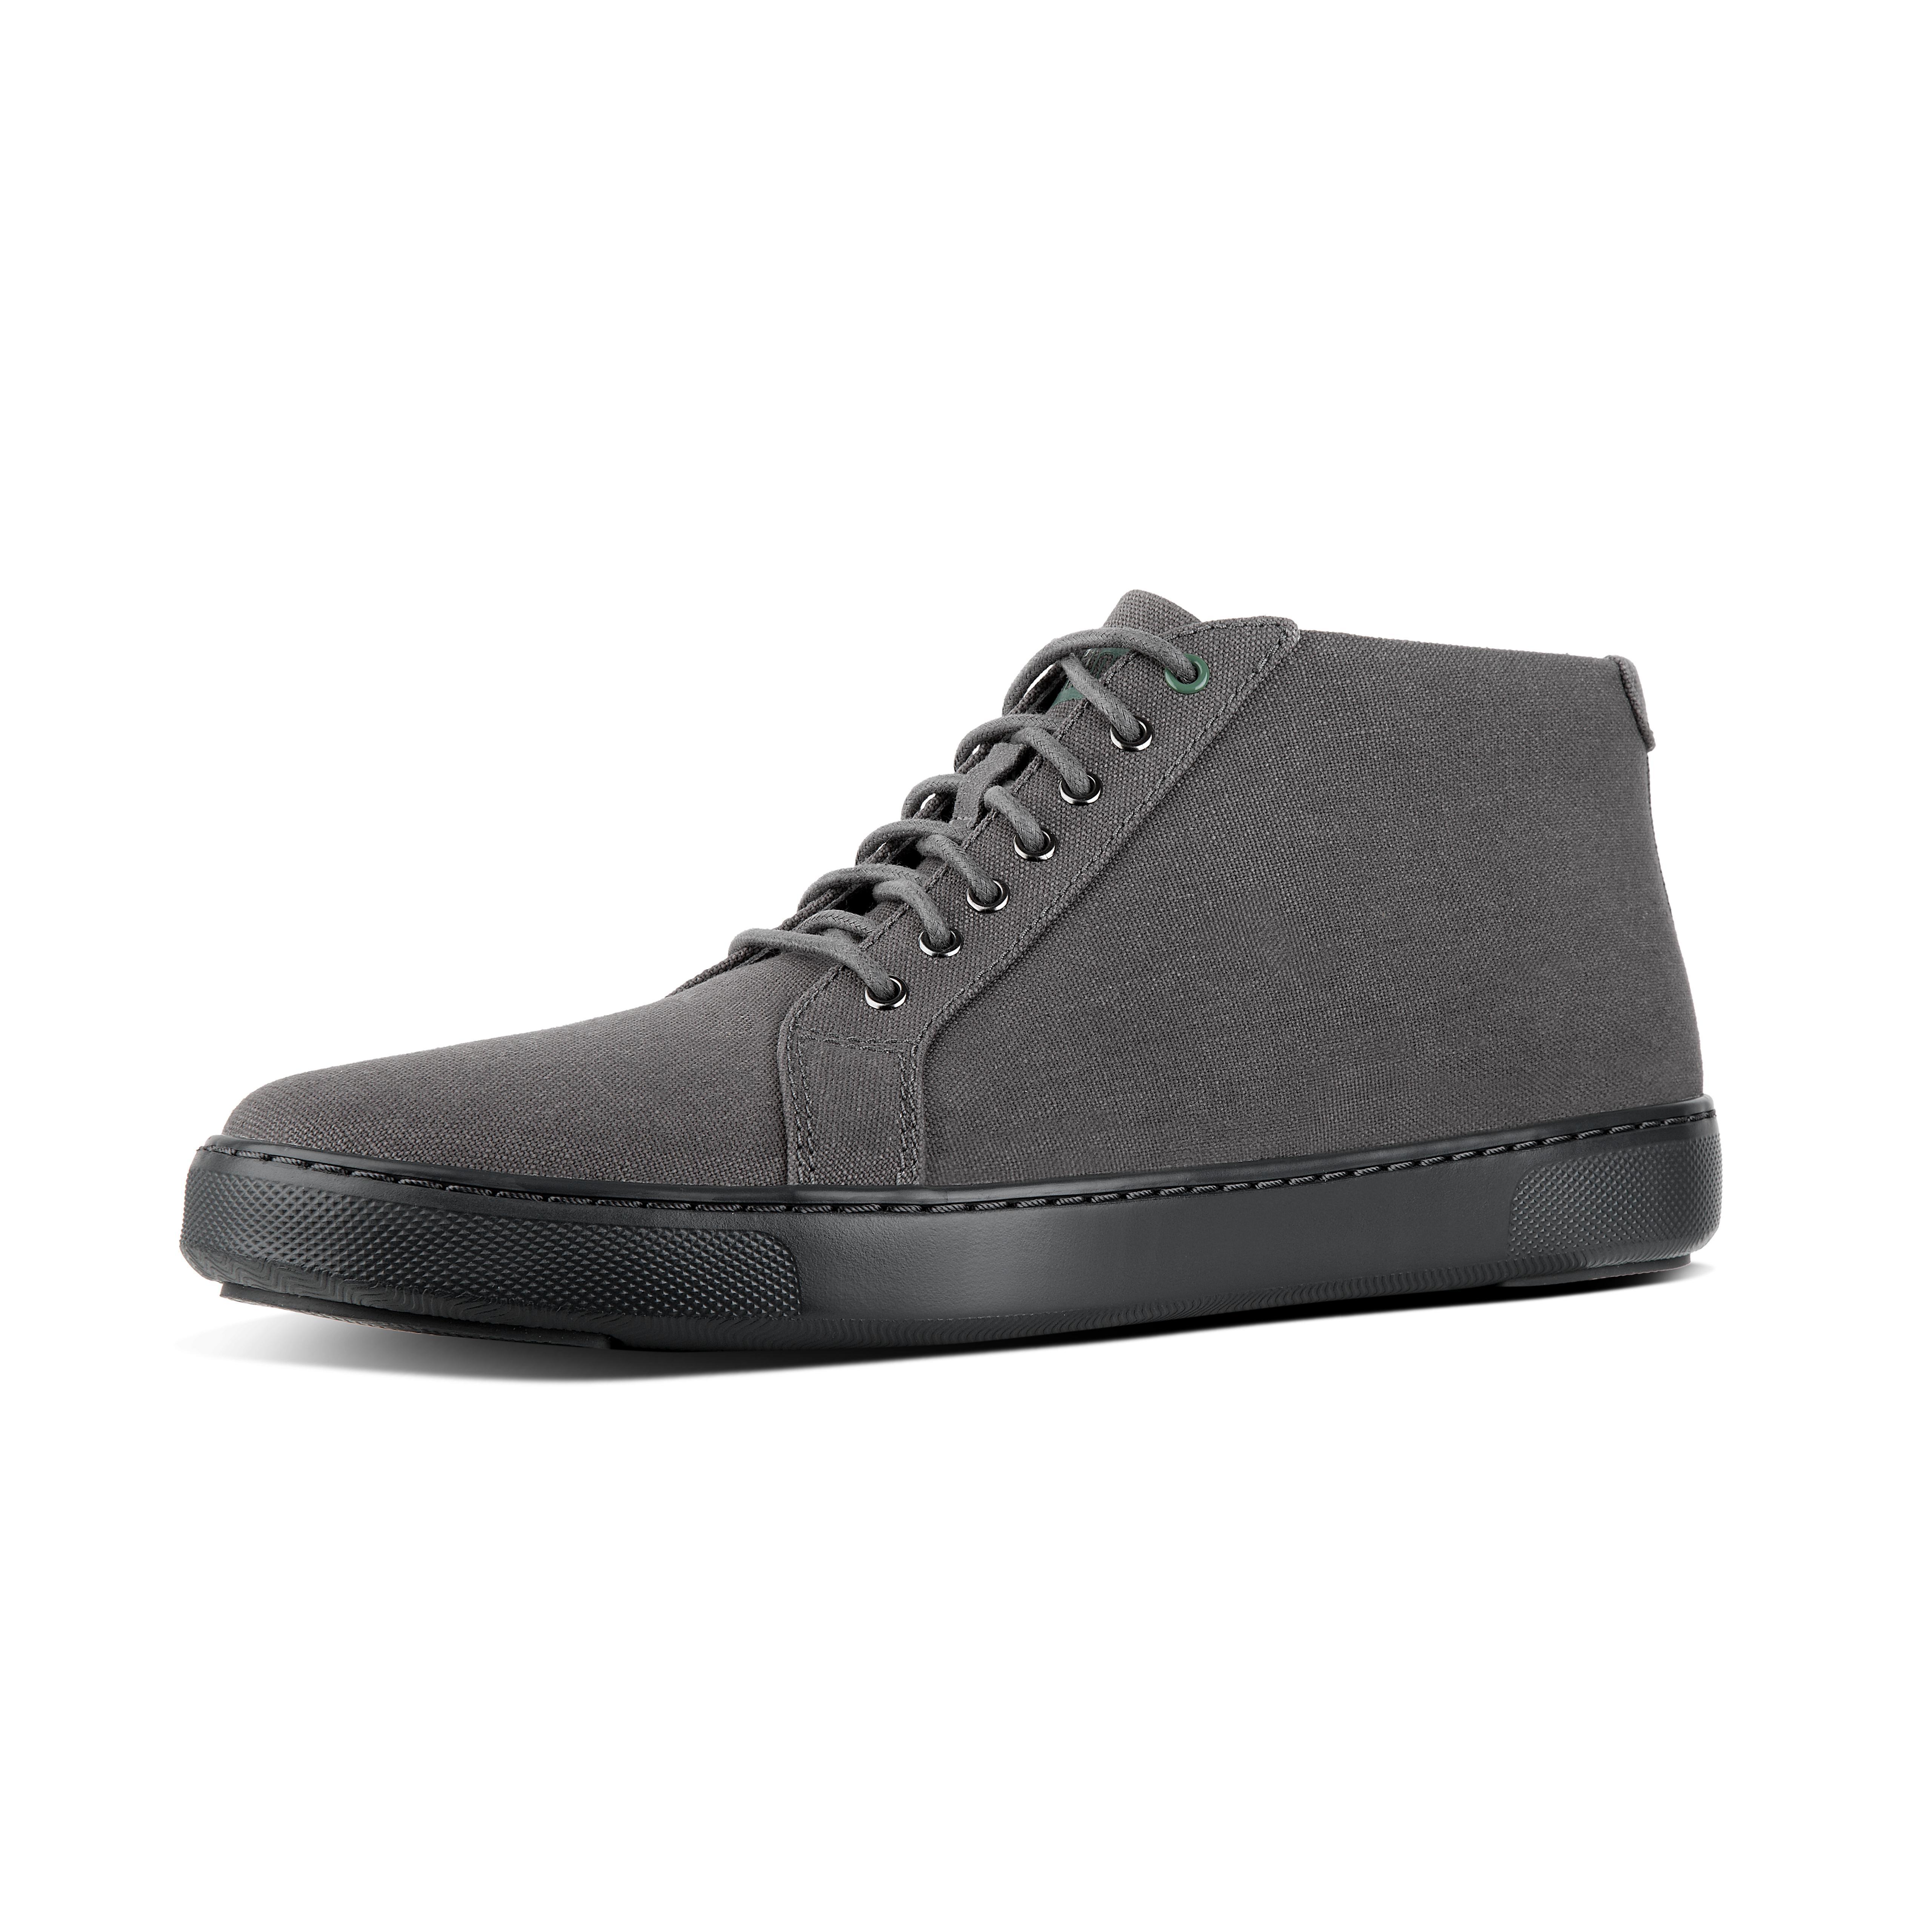 Andor canvas sneaker charcoal grey m88 052?v=3